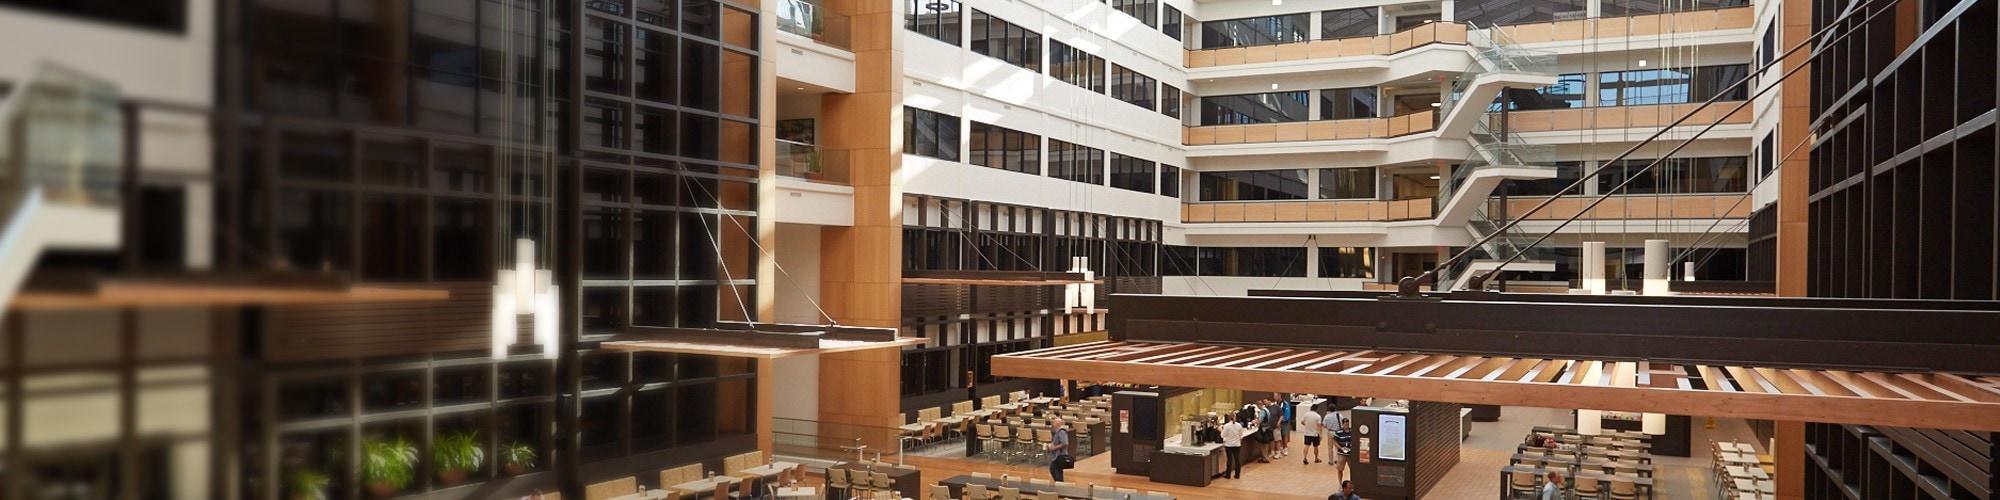 SAS Building R with interior atrium design at Cary, NC headquarters